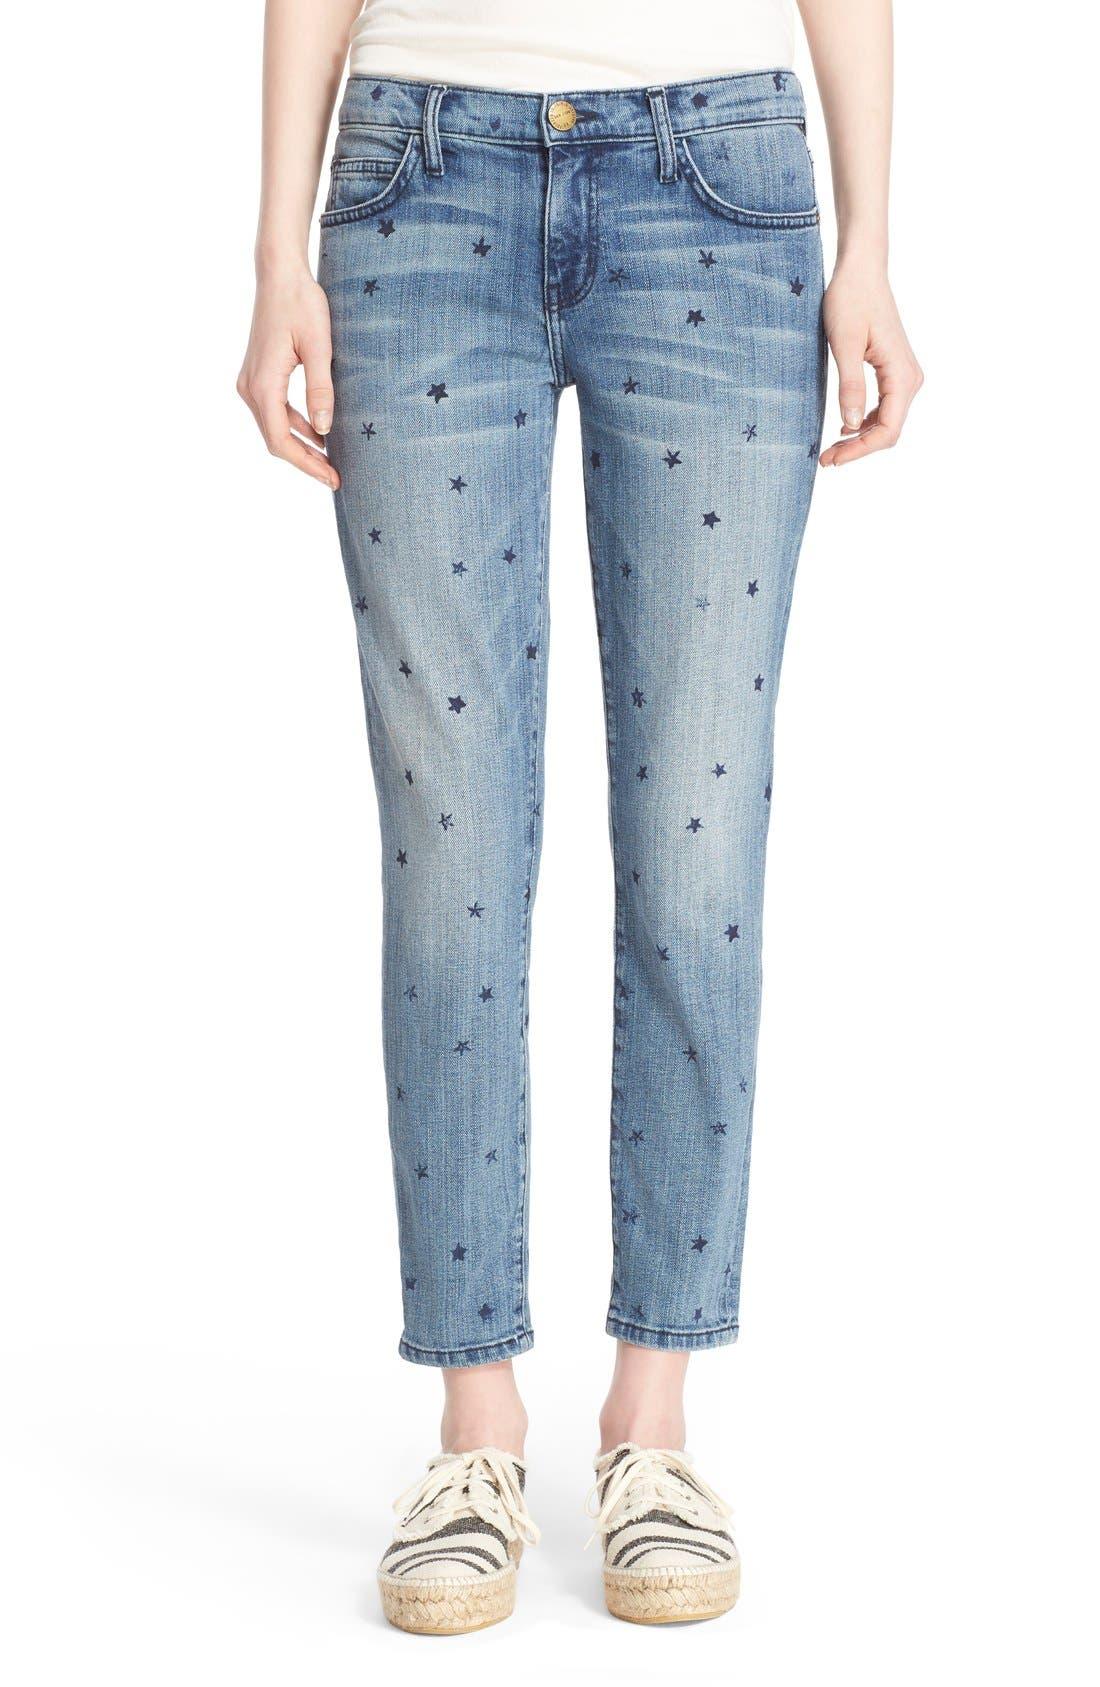 Alternate Image 1 Selected - Current/Elliott 'The Stiletto' Star Print Skinny Jeans (Revival with Mini Navy Stars)